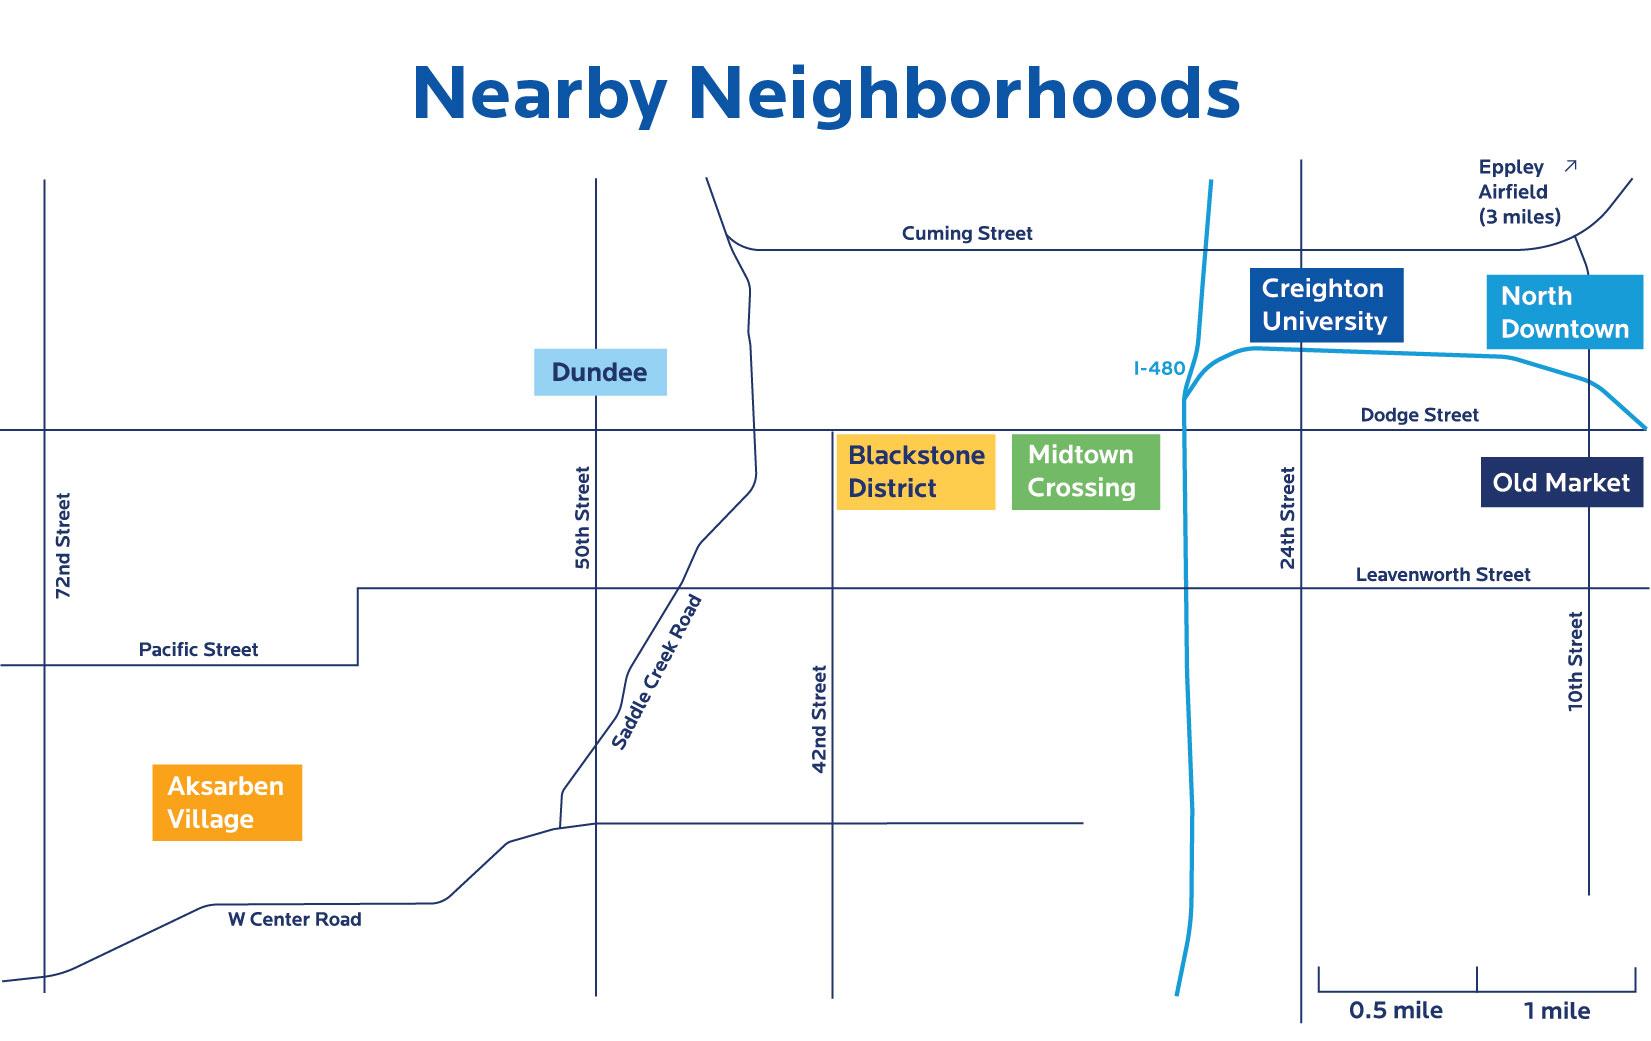 Nearby Neighborhood Map